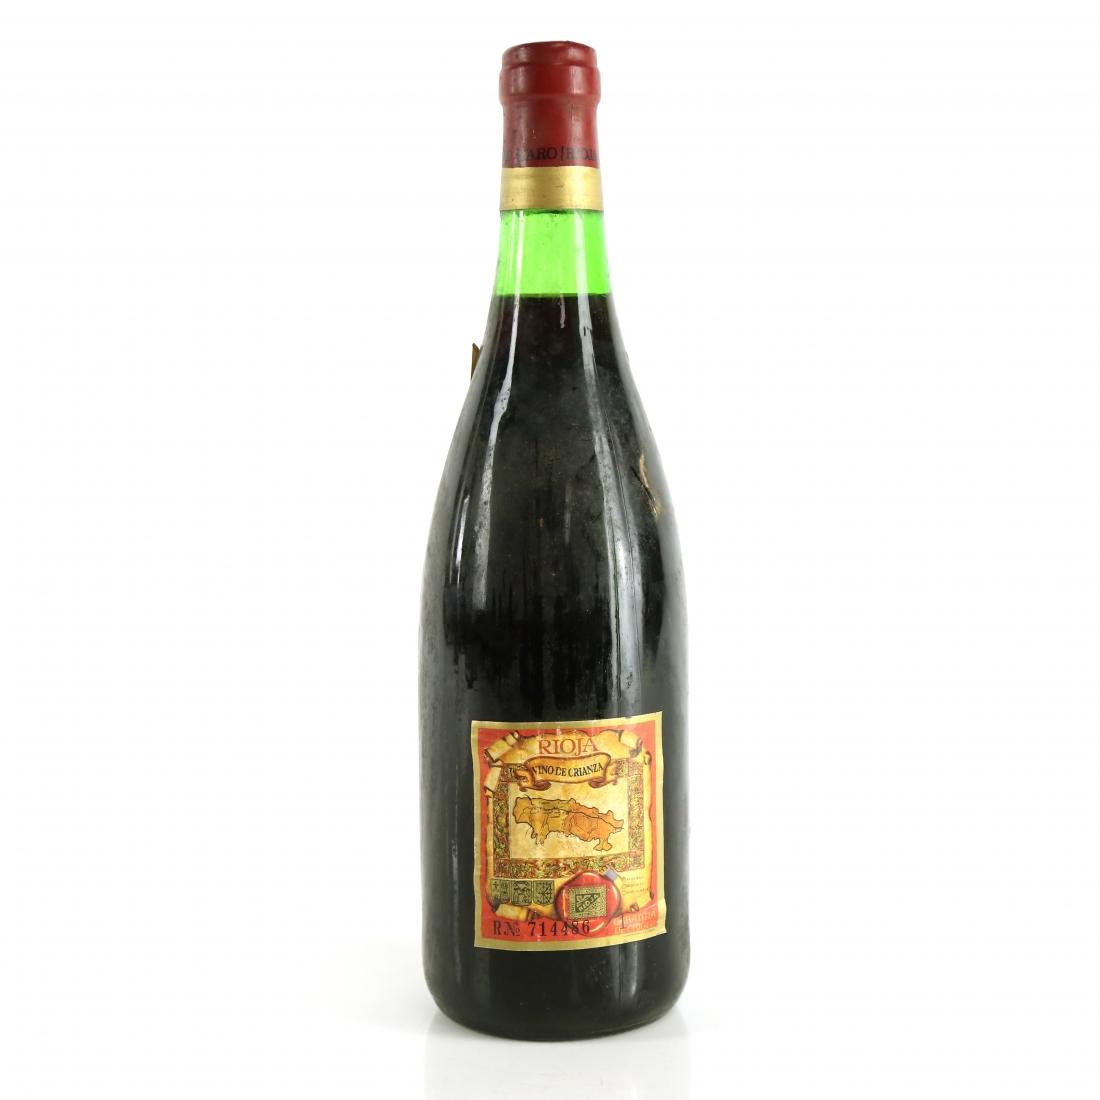 Ramon Bilbao 1968 Rioja Crianza